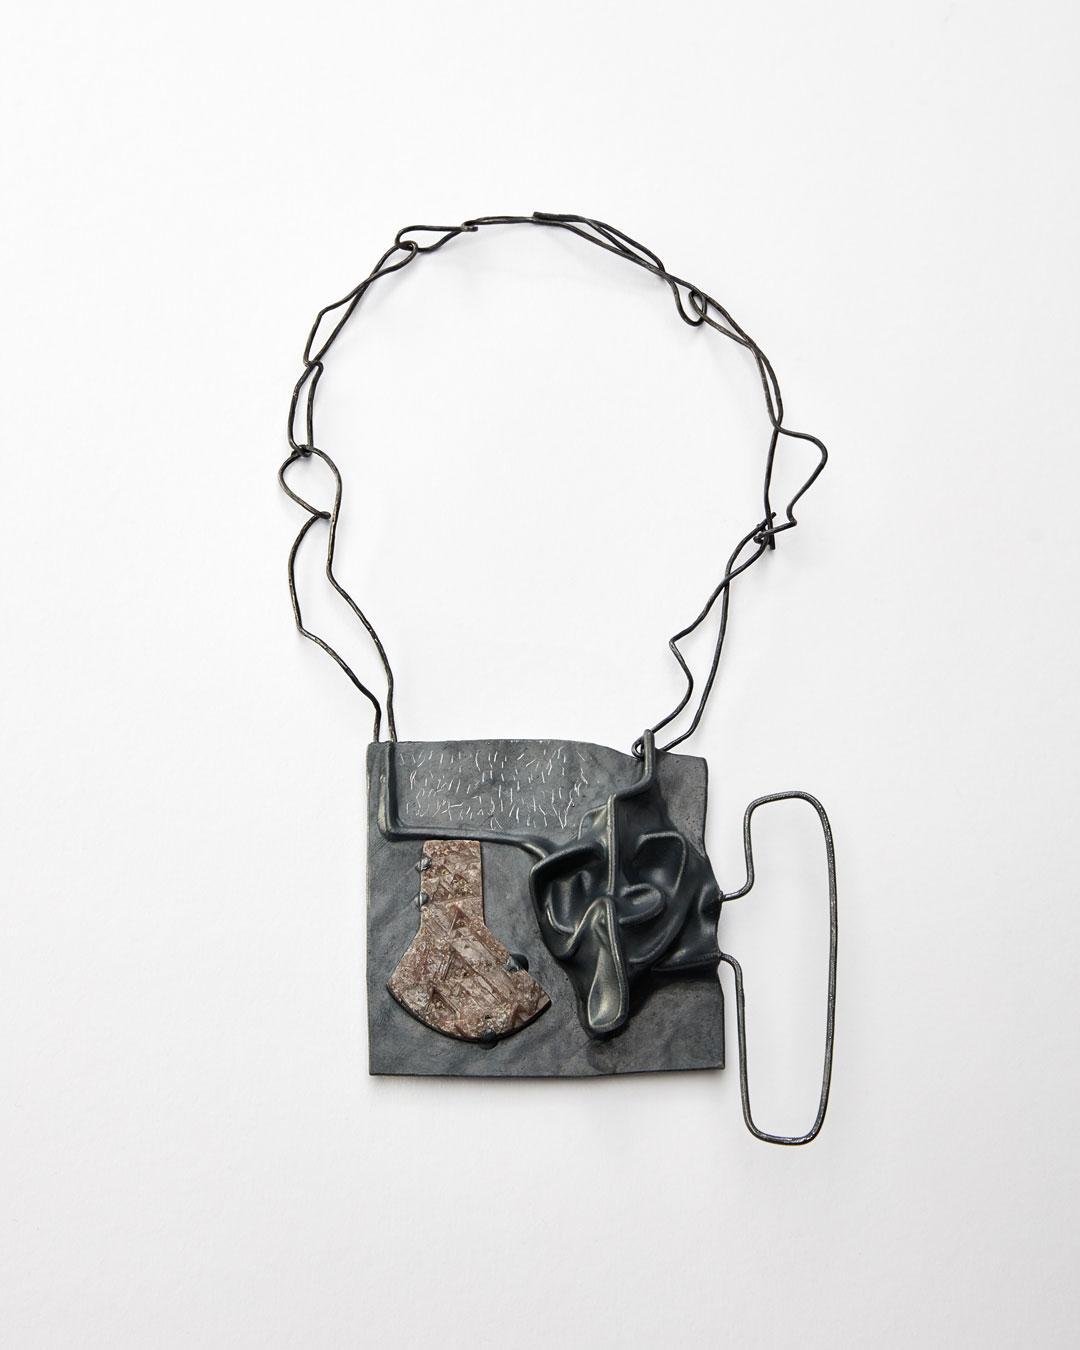 Iris Bodemer, Klang 1 (Sound 1), 2019, hanger; zilver, thermoplast, saffier, 105 x 115 x 25 mm, €4250